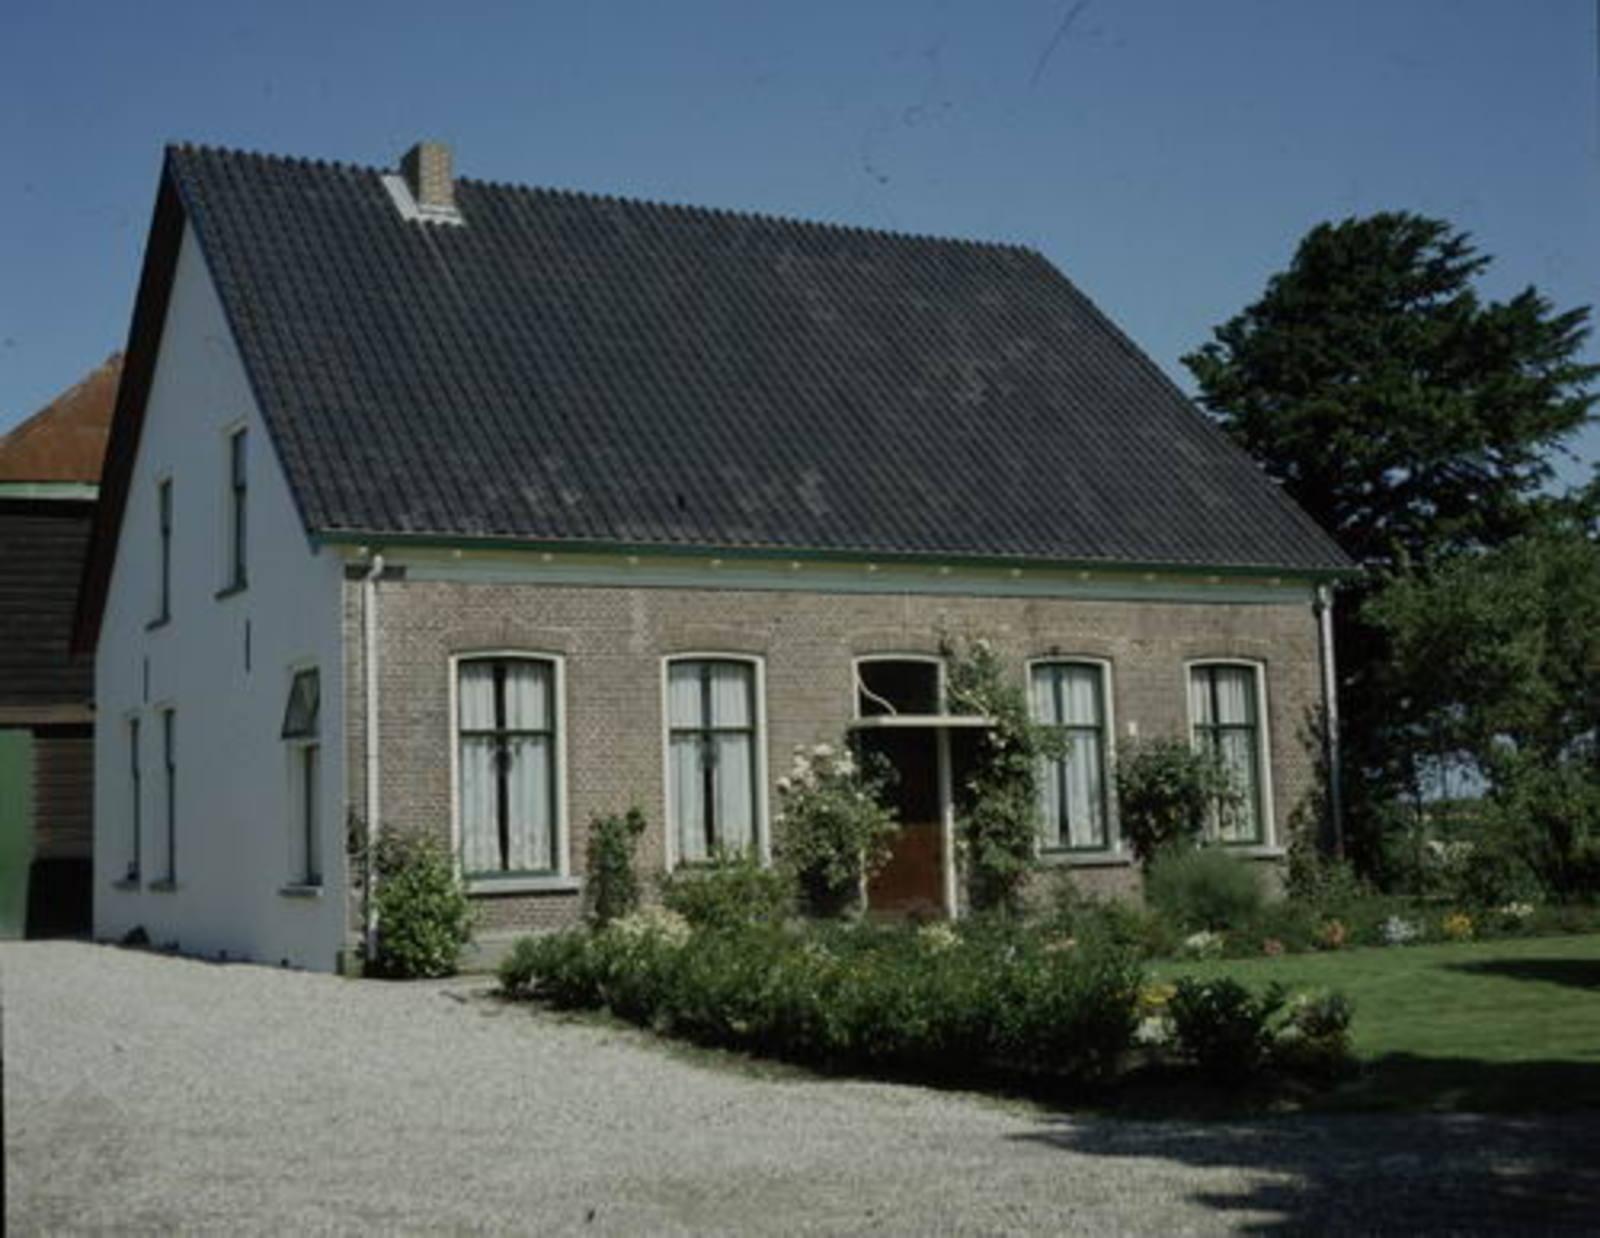 IJweg W 1107 1981 boerderij Kleine Badhoeve 01